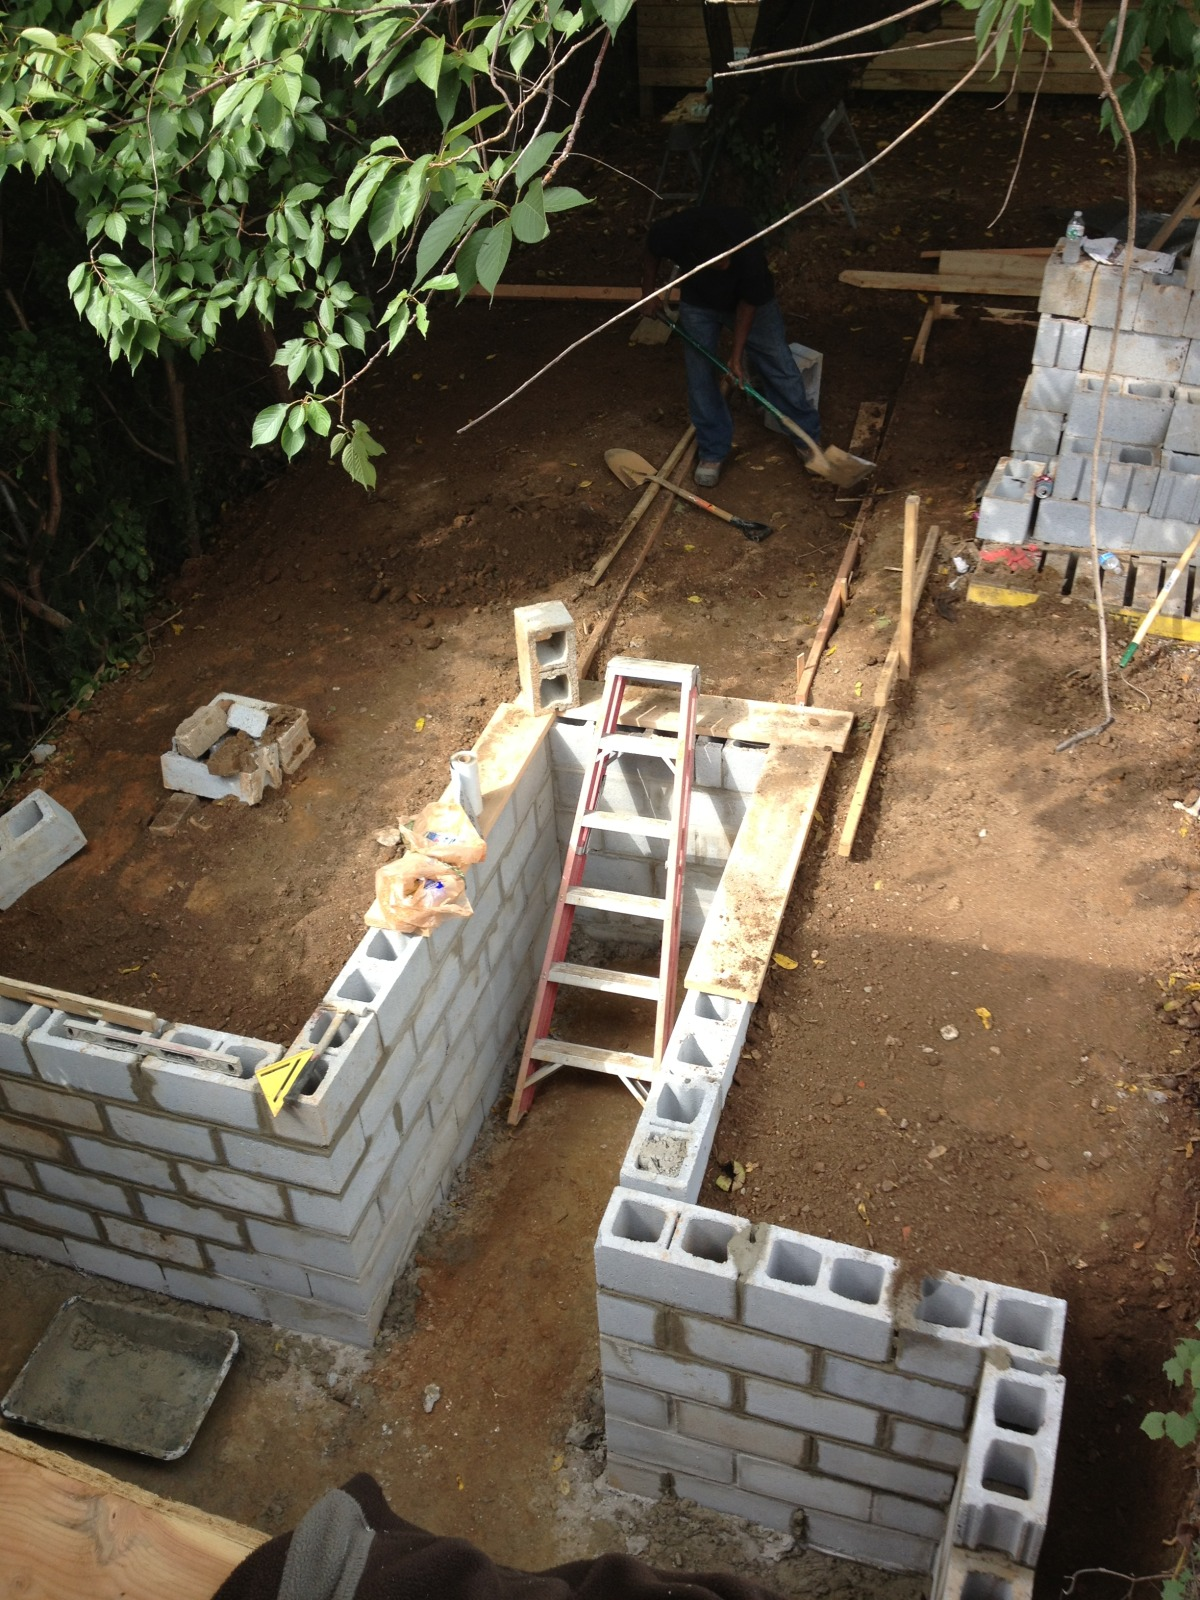 c - 3523 sunnyside foundations 14.jpg